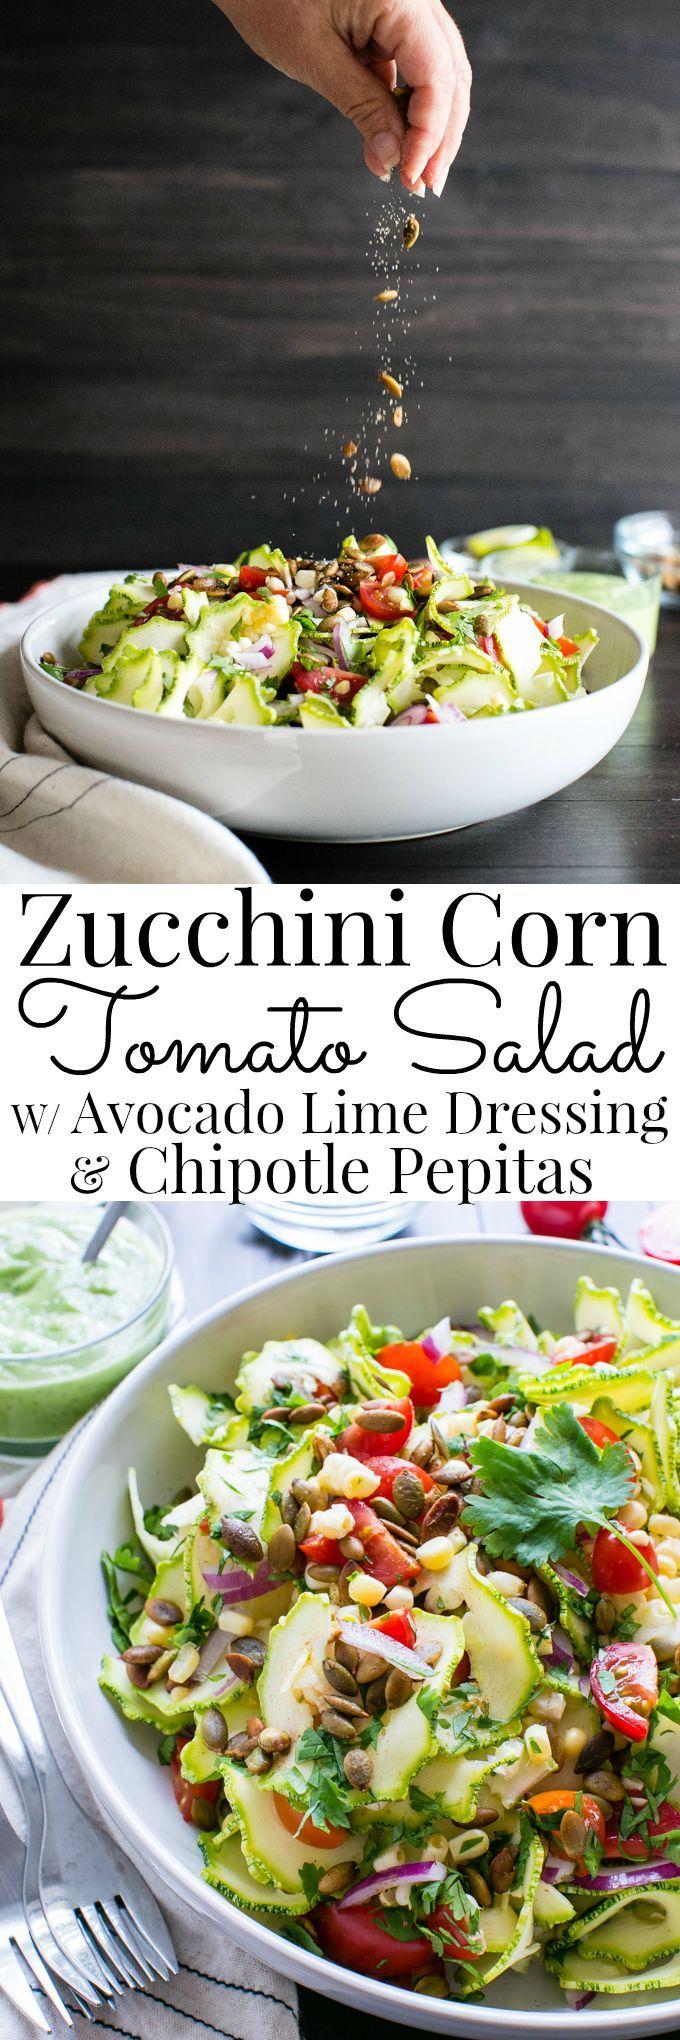 YUM!!! Zucchini Corn Tomato Salad with Avocado Lime Dressing & Chipotle Pepitas #healthy